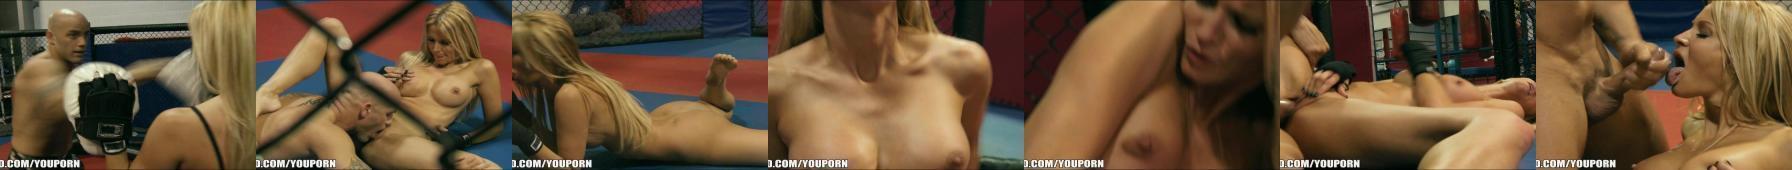 Filmy porno z Jessica Drake